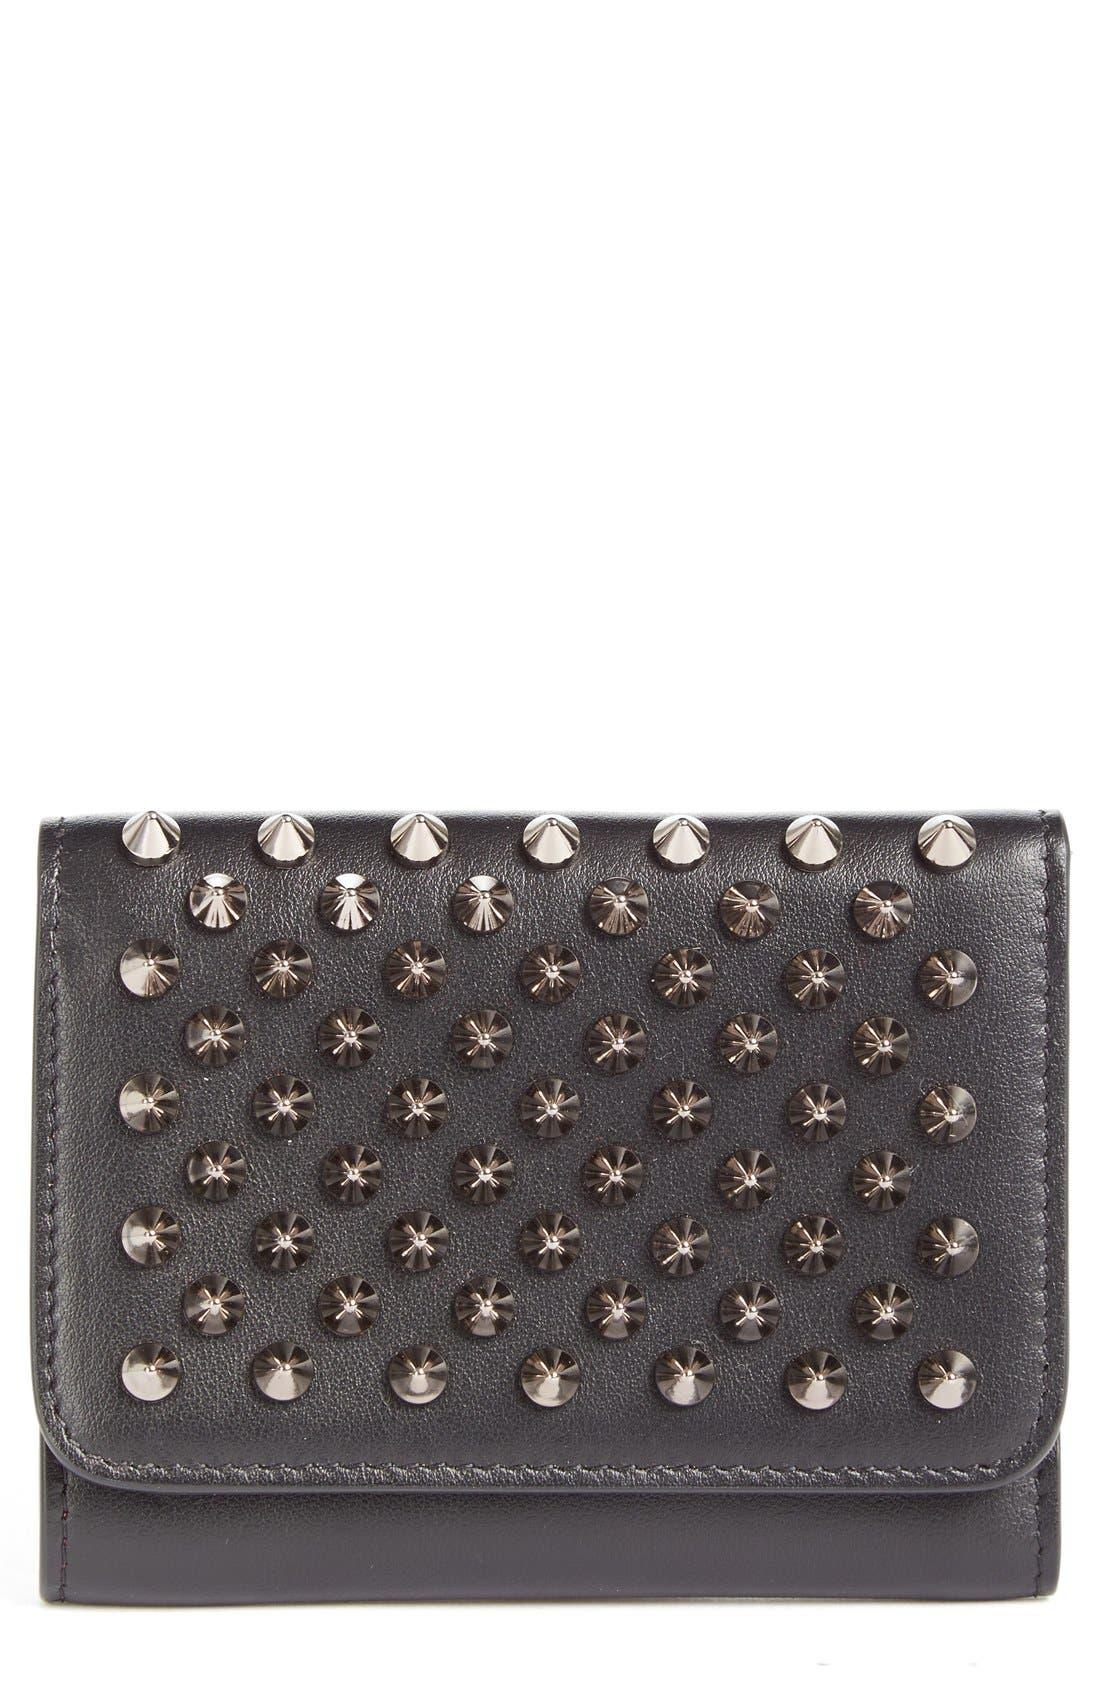 Main Image - Christian Louboutin Macaron Leather French Wallet